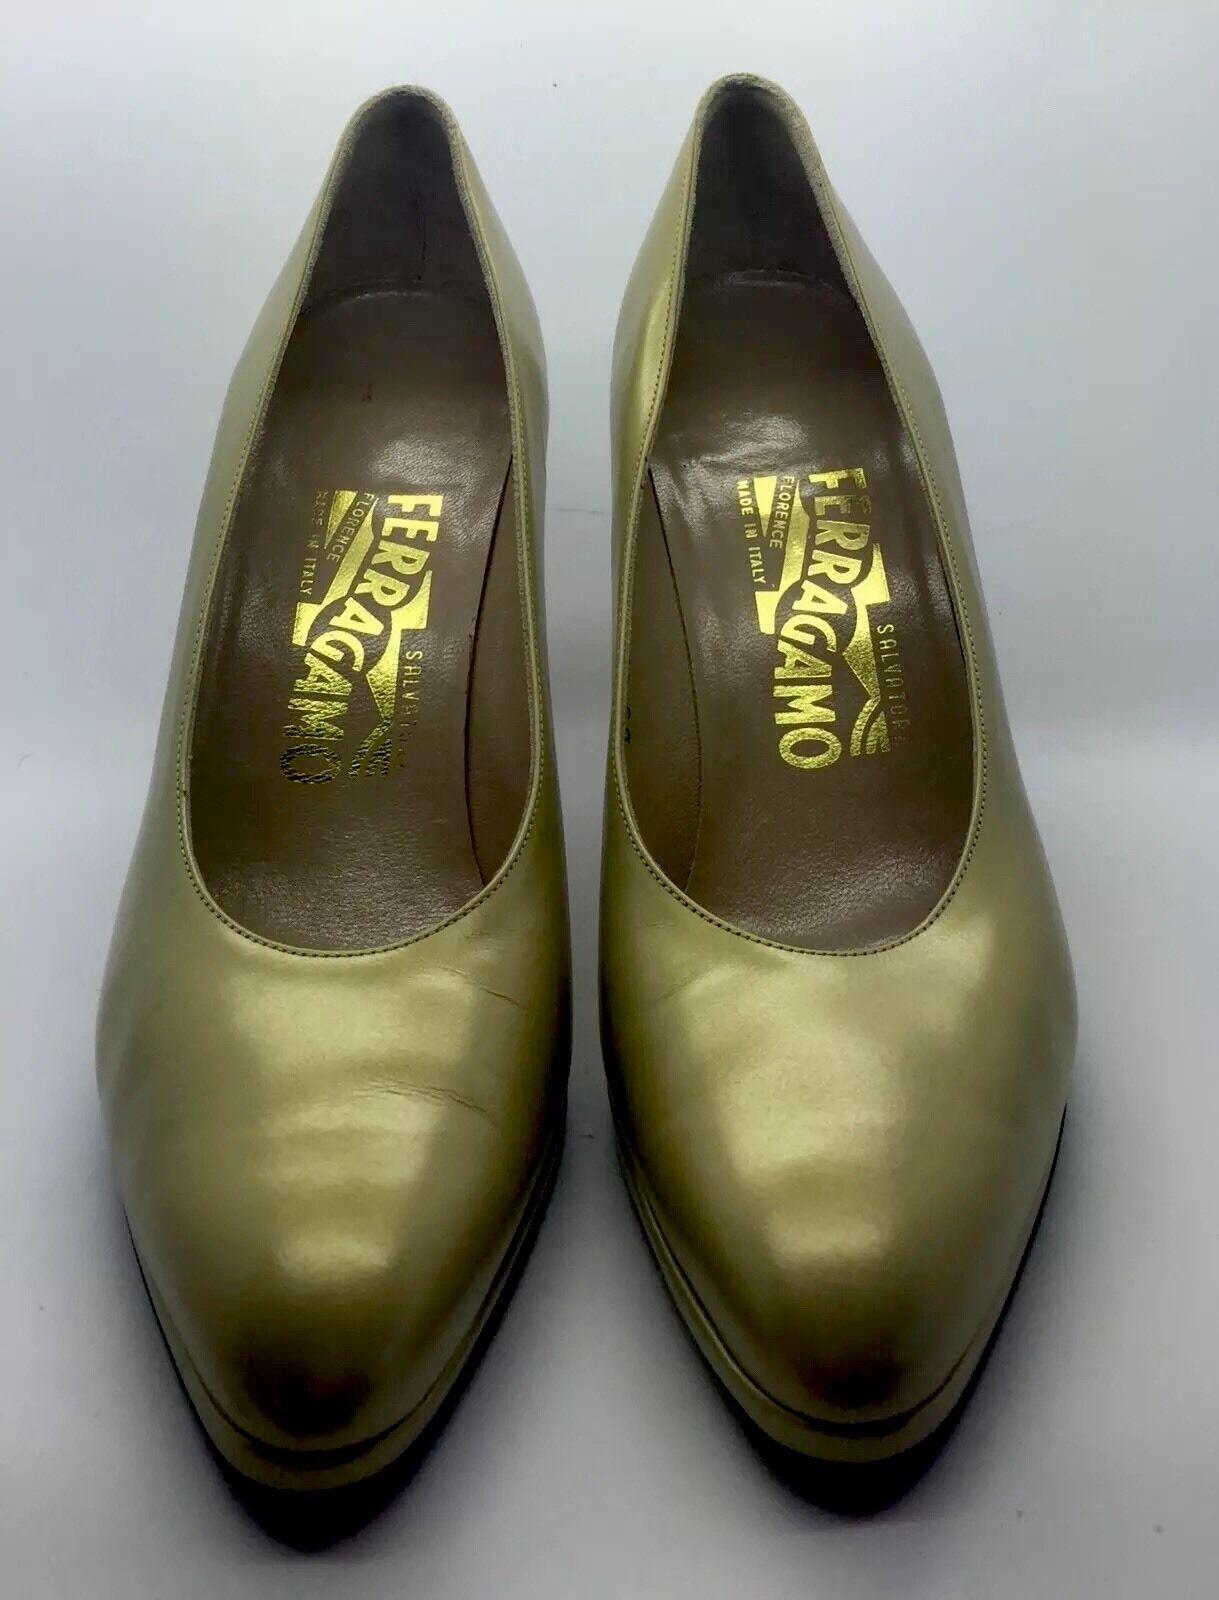 SALVATORE FERRAGAMO Golden Tan Classic Pump Heels Woman's Woman's Woman's 7 3A  Worn Twice 25bff8